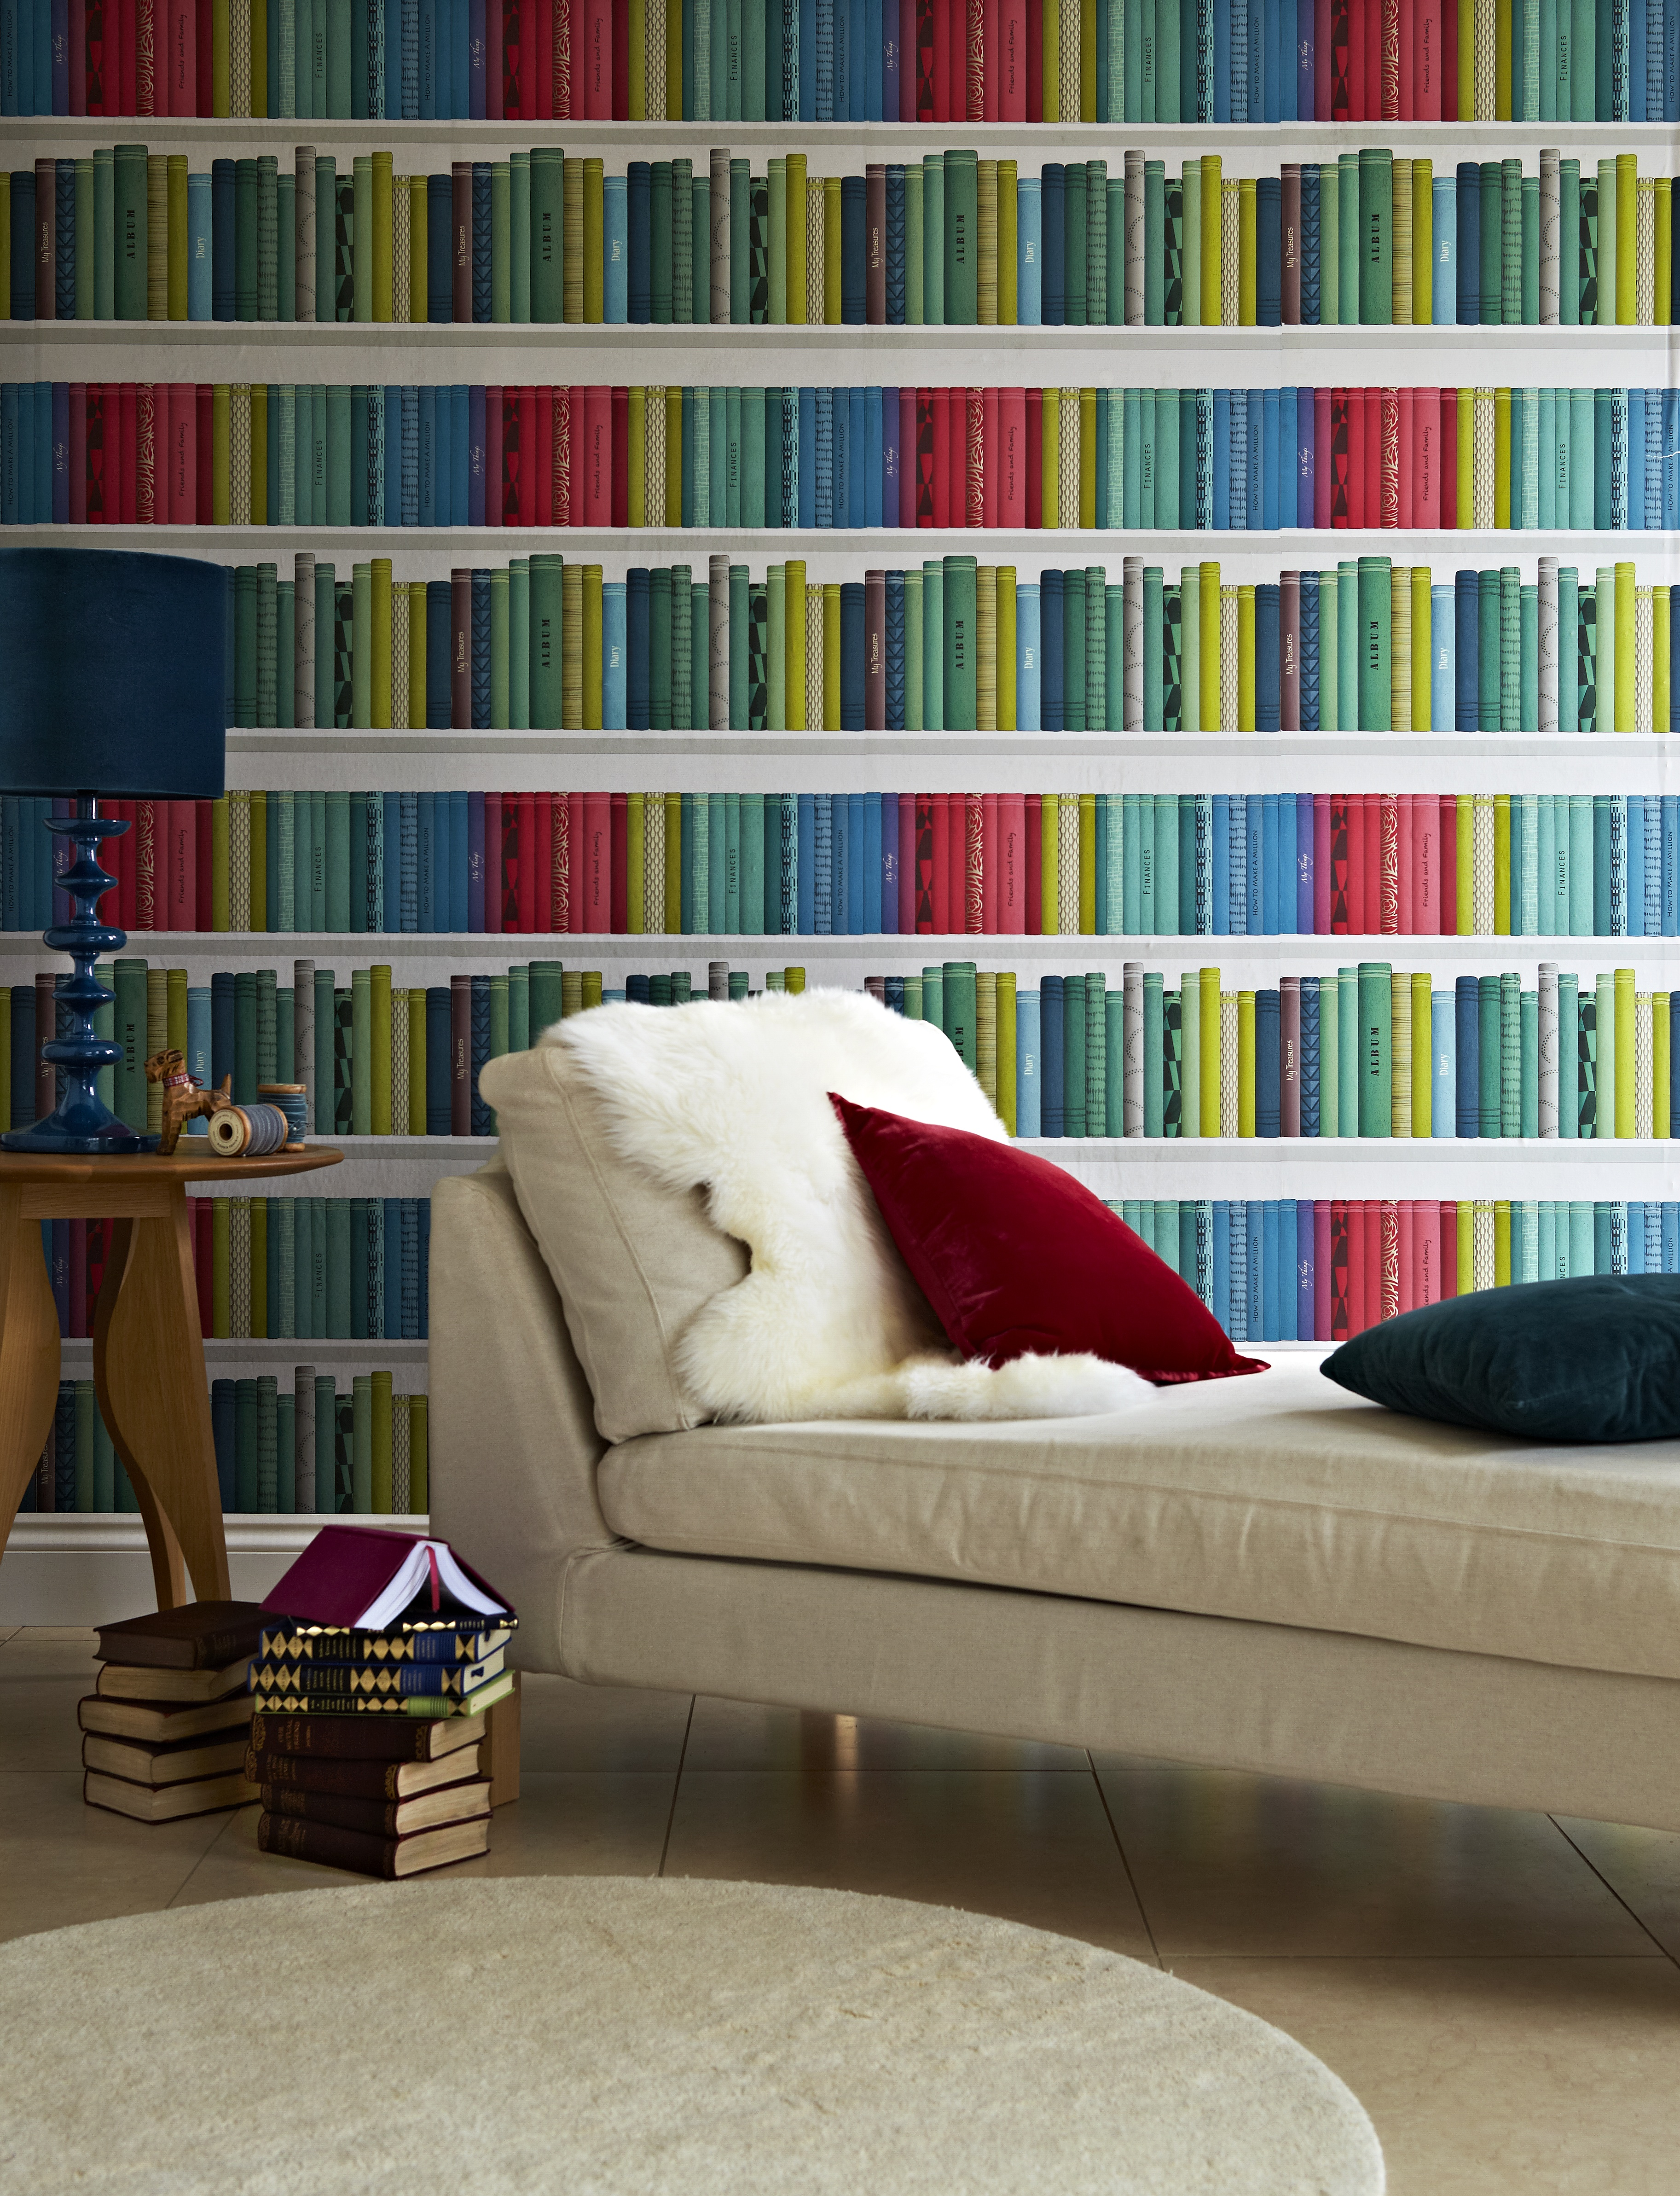 Free Download Diy Bookshelf Design Wallpaper Pdf Plans Build